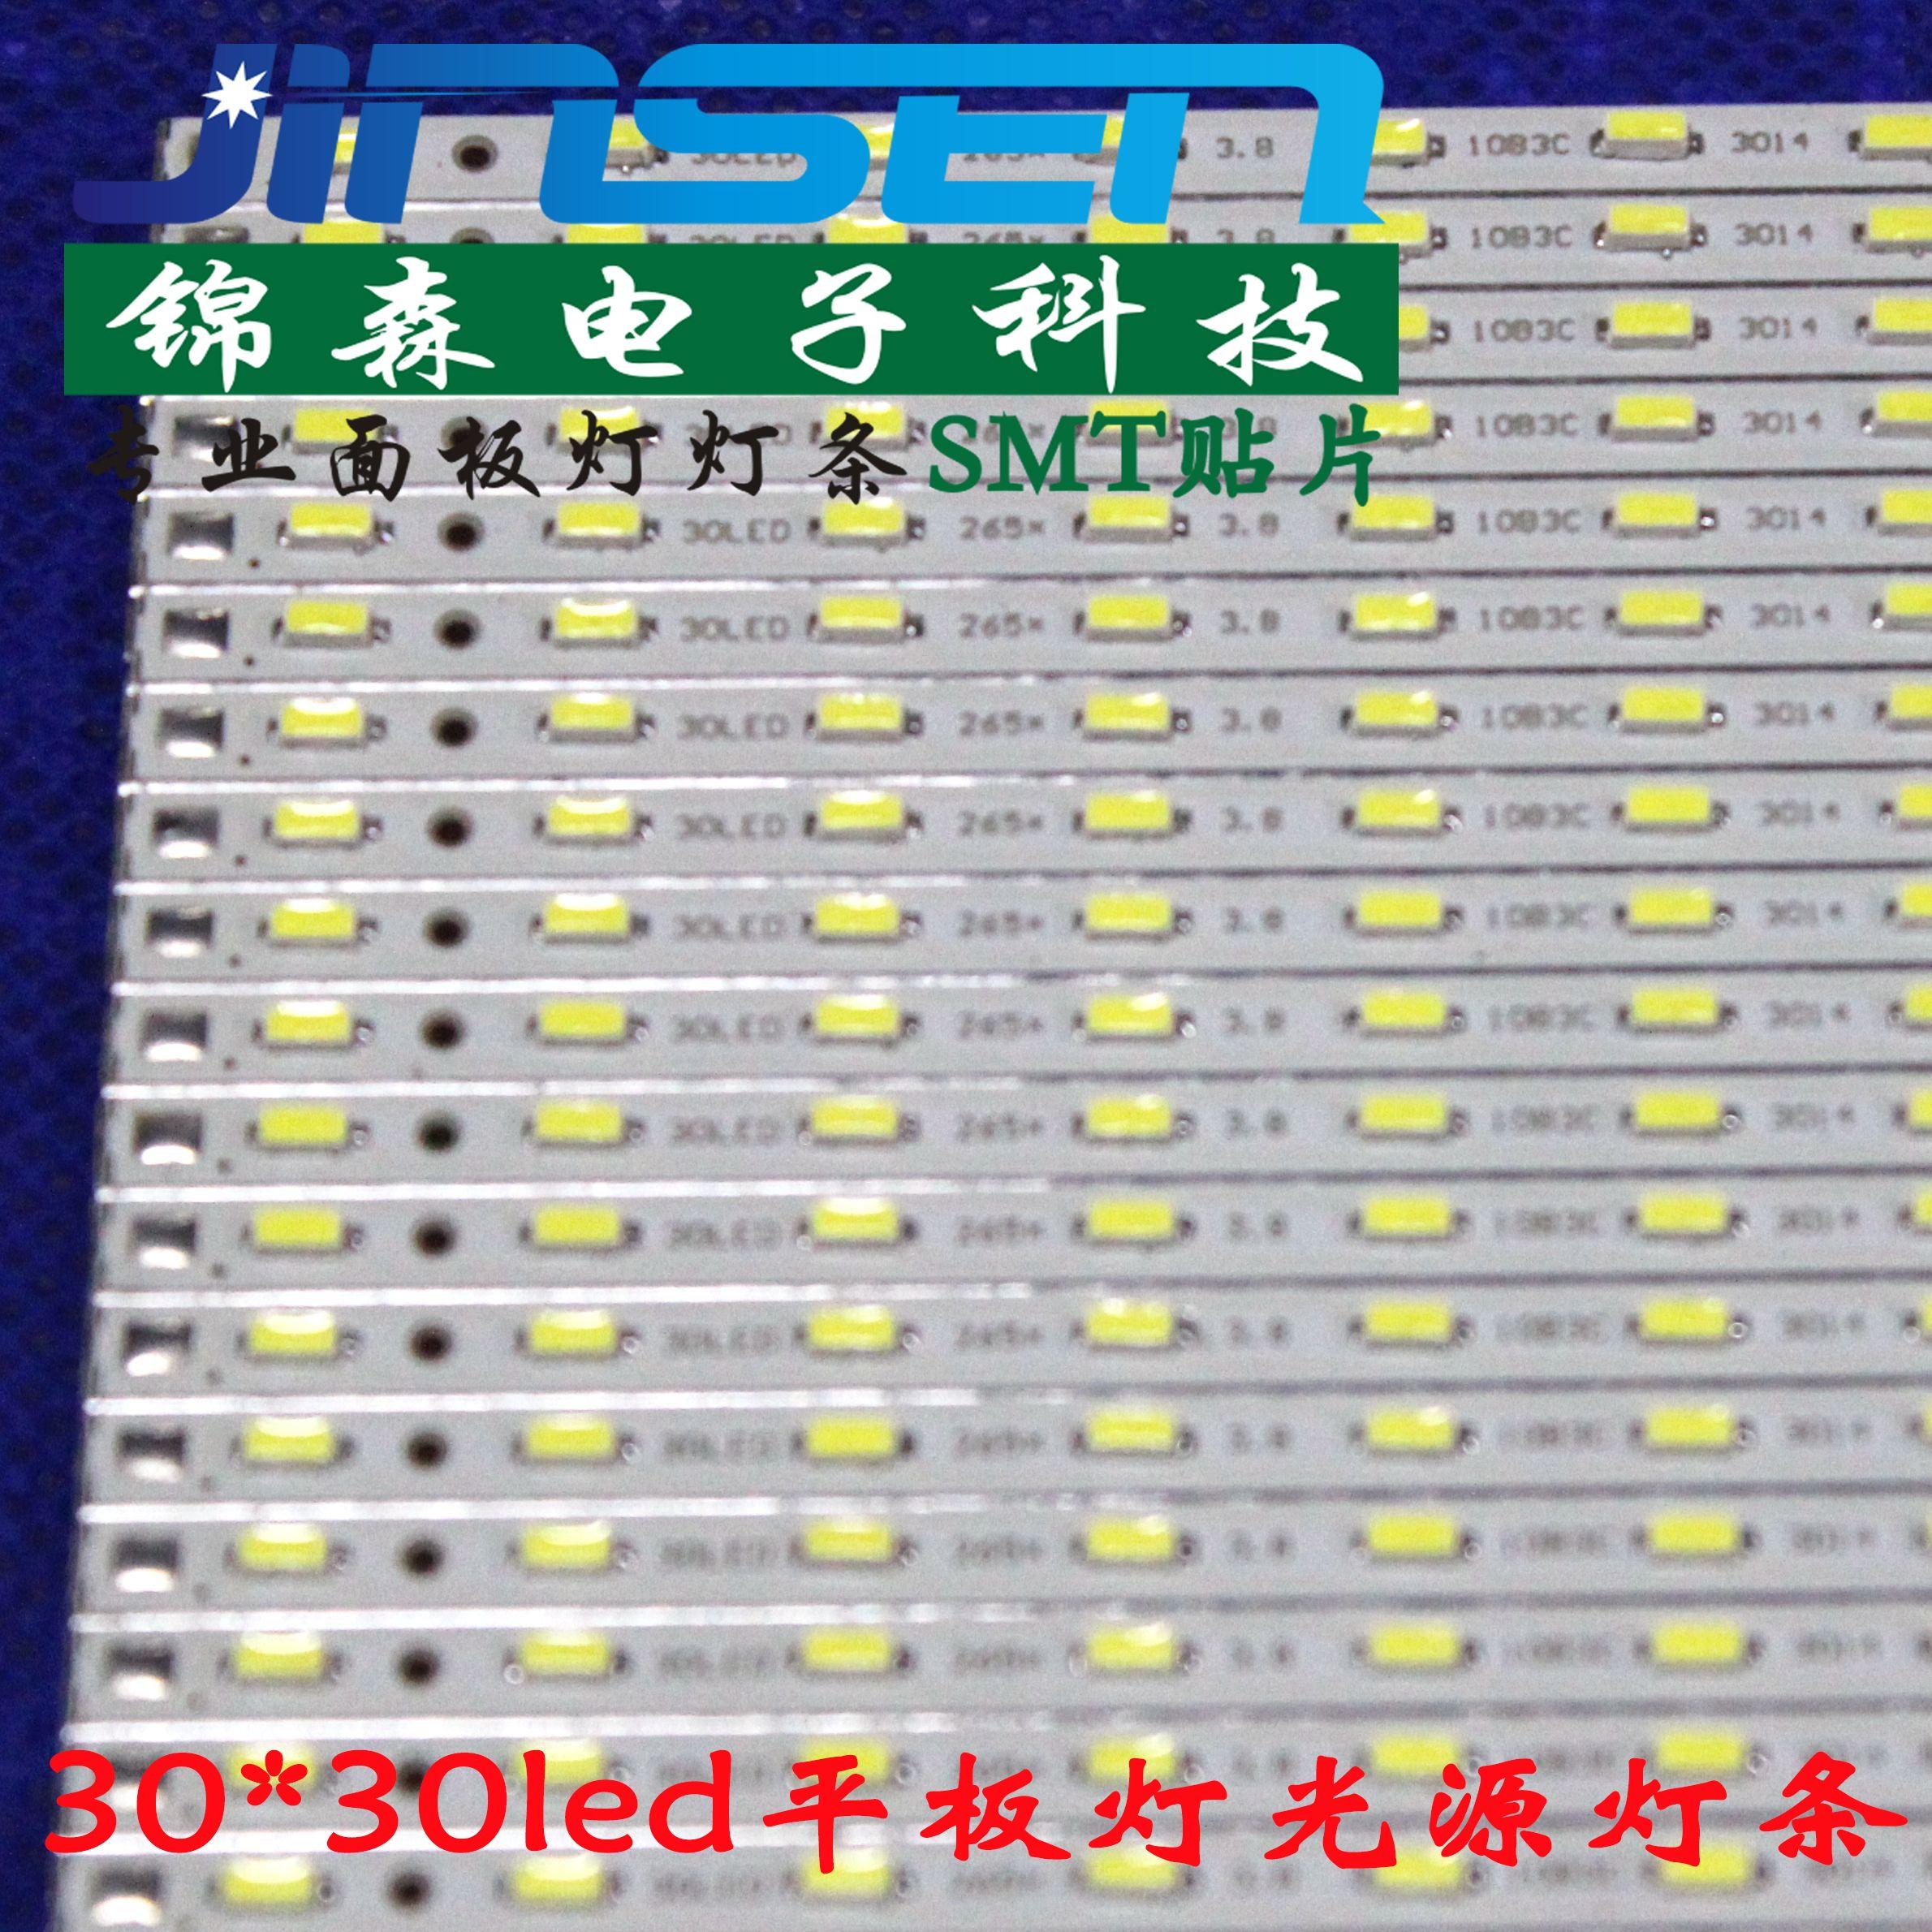 30LED平板灯专用4014硬灯条 300300面板灯铝基板灯条